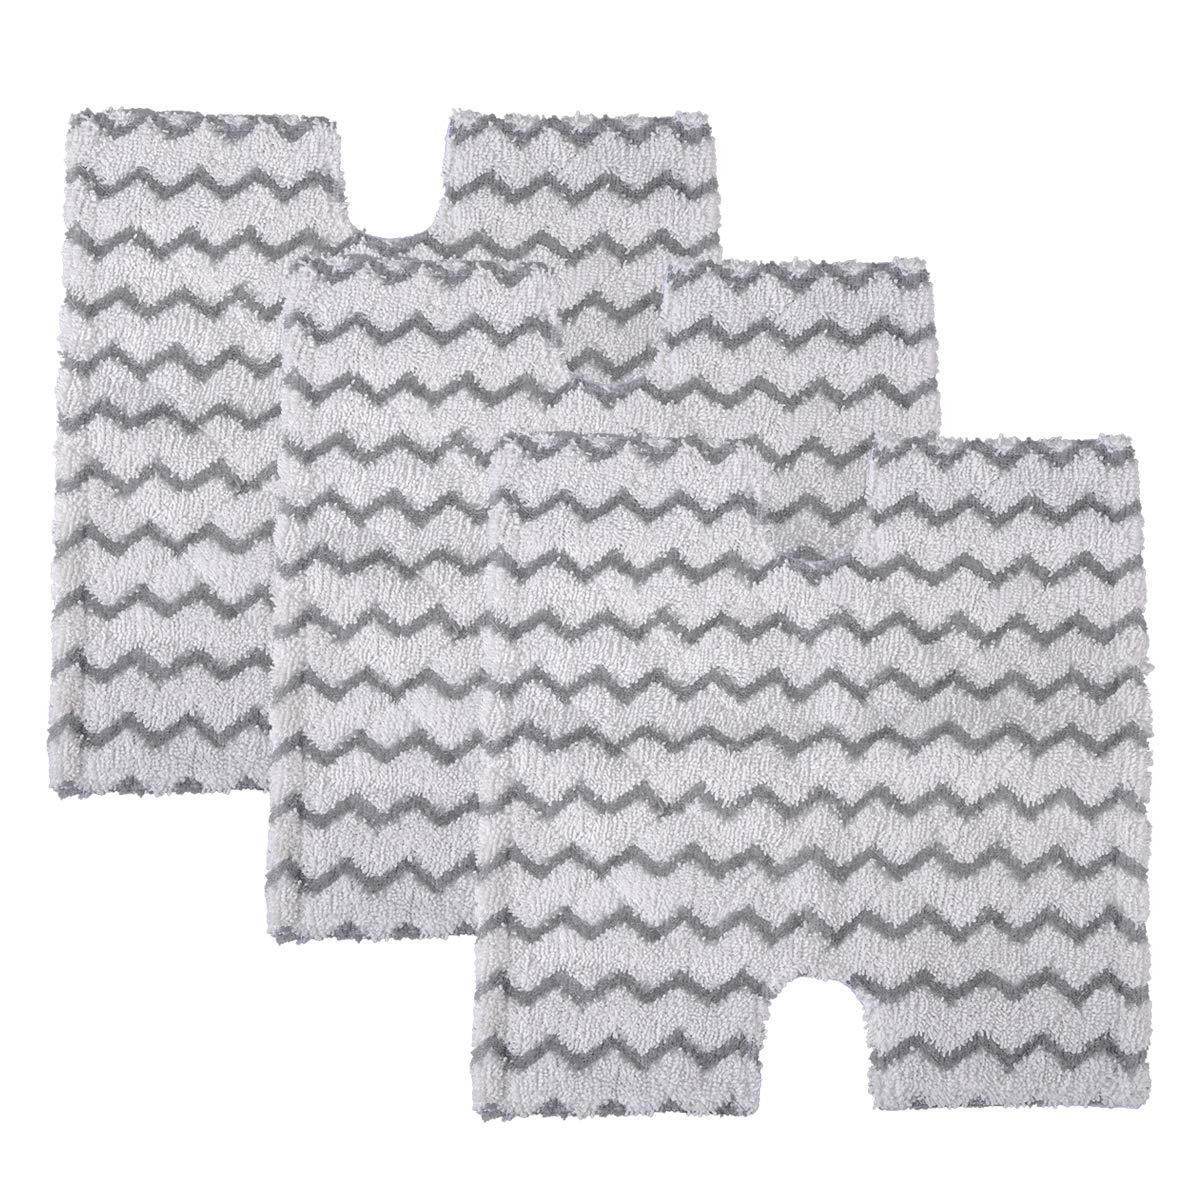 2pcs replacement steam mop pads for shark s3973 s6001w steam mop cloth cover pad floor steam cleaner mops for shark s5003a s6002 Steam Mop Pads Replacement for Shark Lift-Away & Genius Steam Pocket Mop S3973D S6002 S5003D S6001 S6003 S5001 S5002 S3973WM